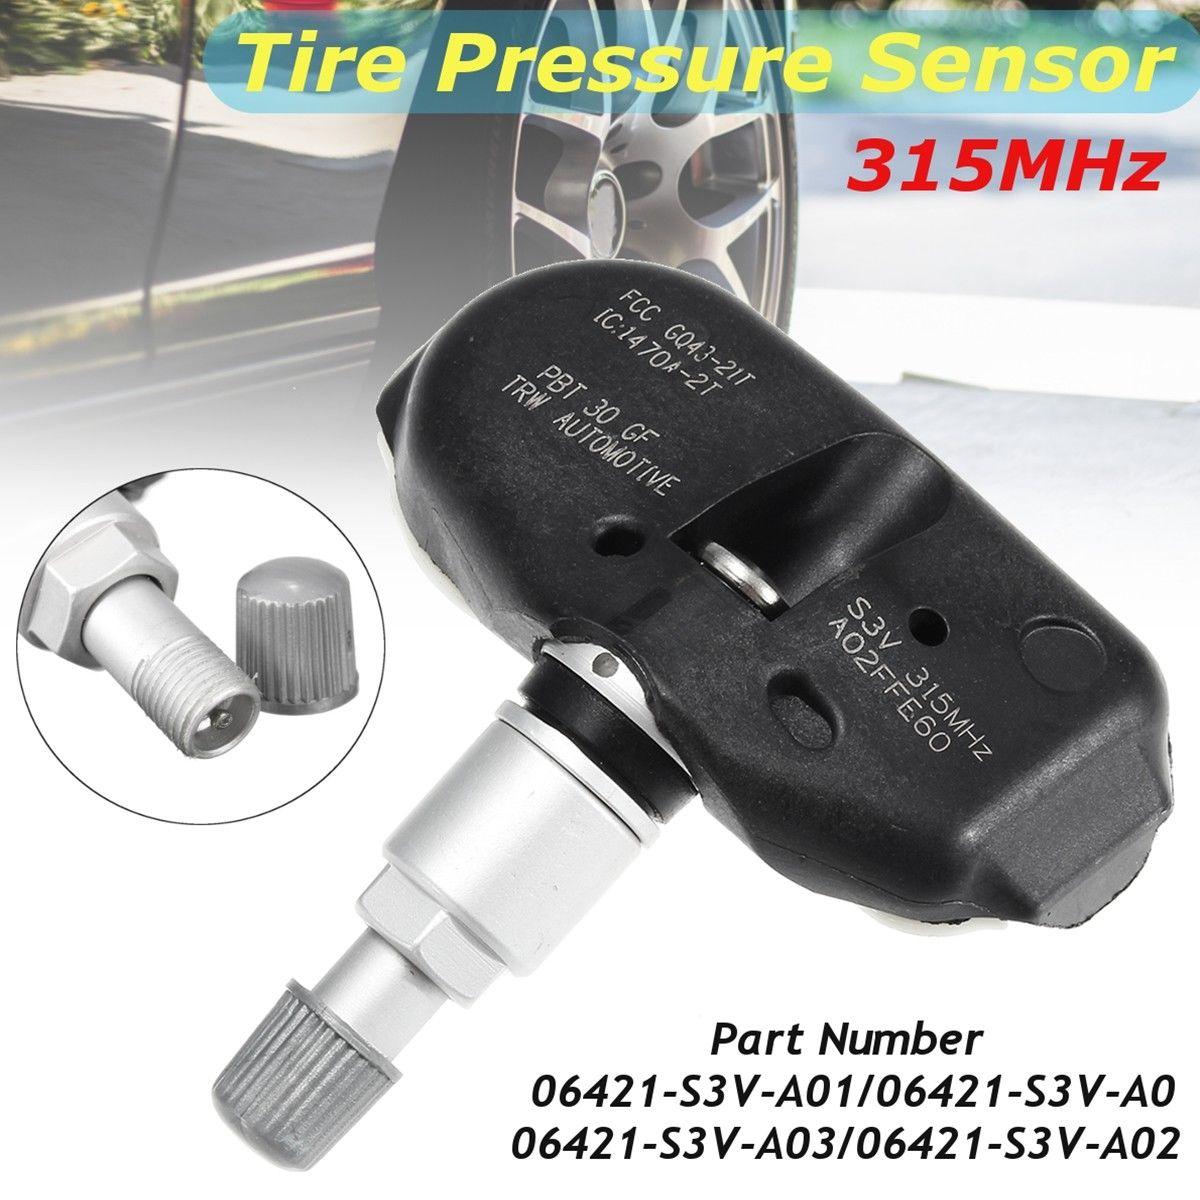 Tire Pressure Sensor TPMS 315MHz 06421 S3V A04 For Acura